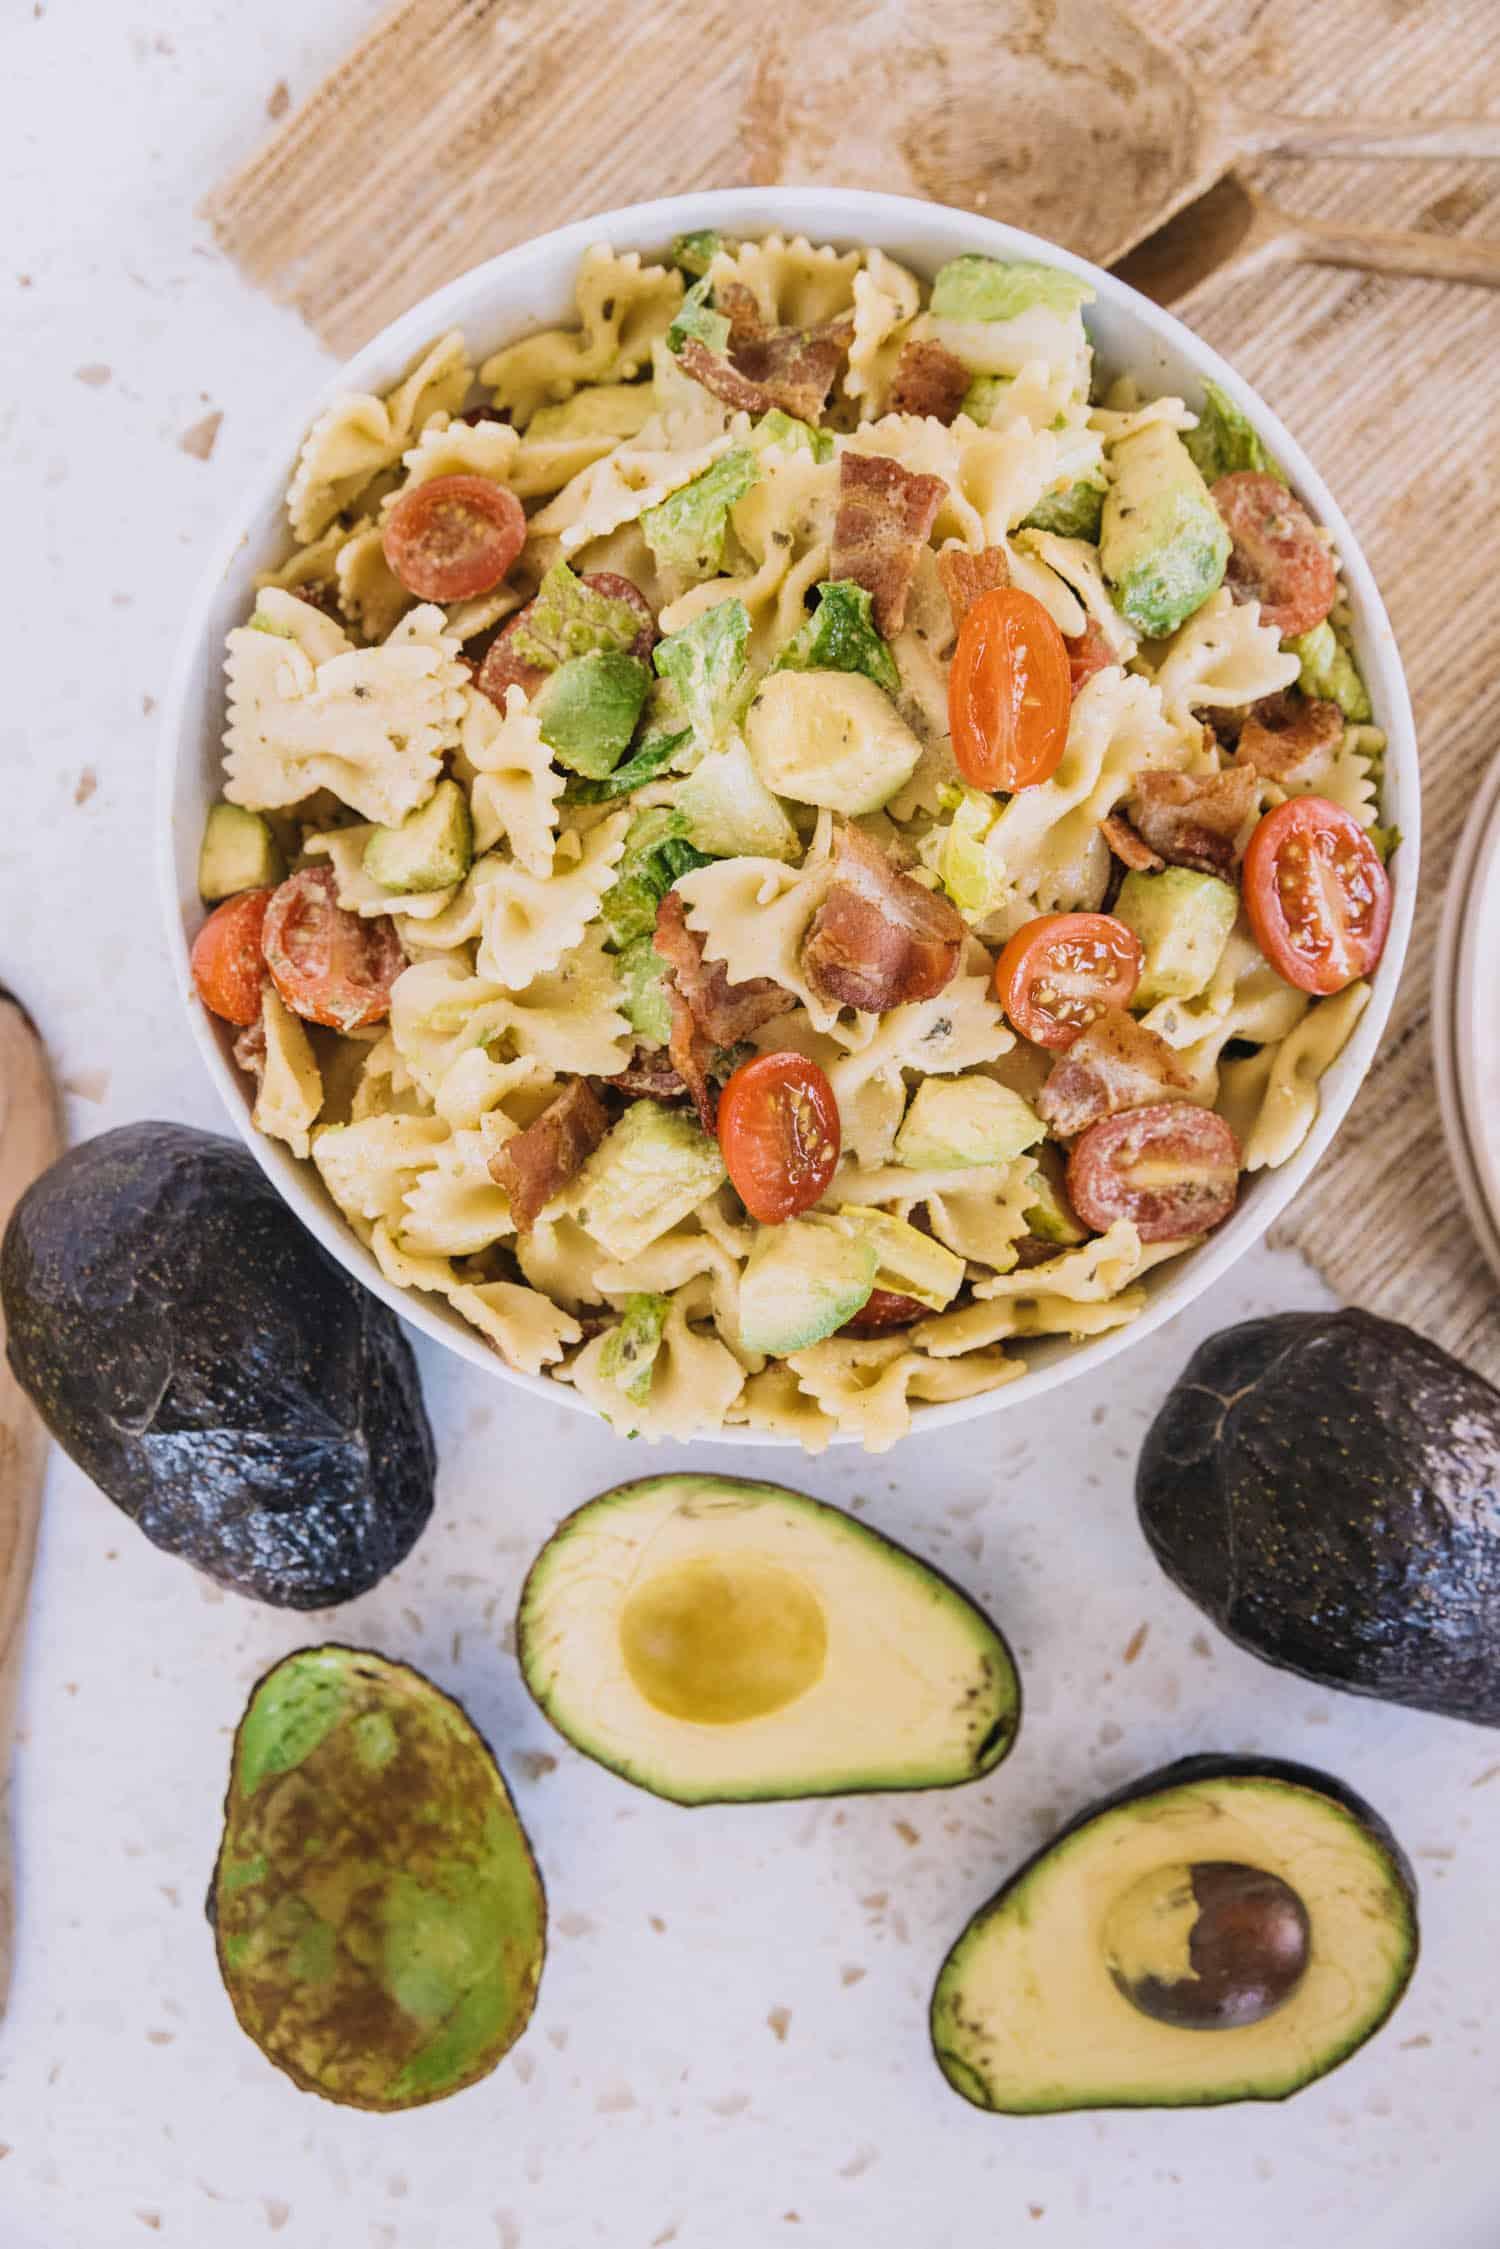 BLT & Avocado Pasta Salad